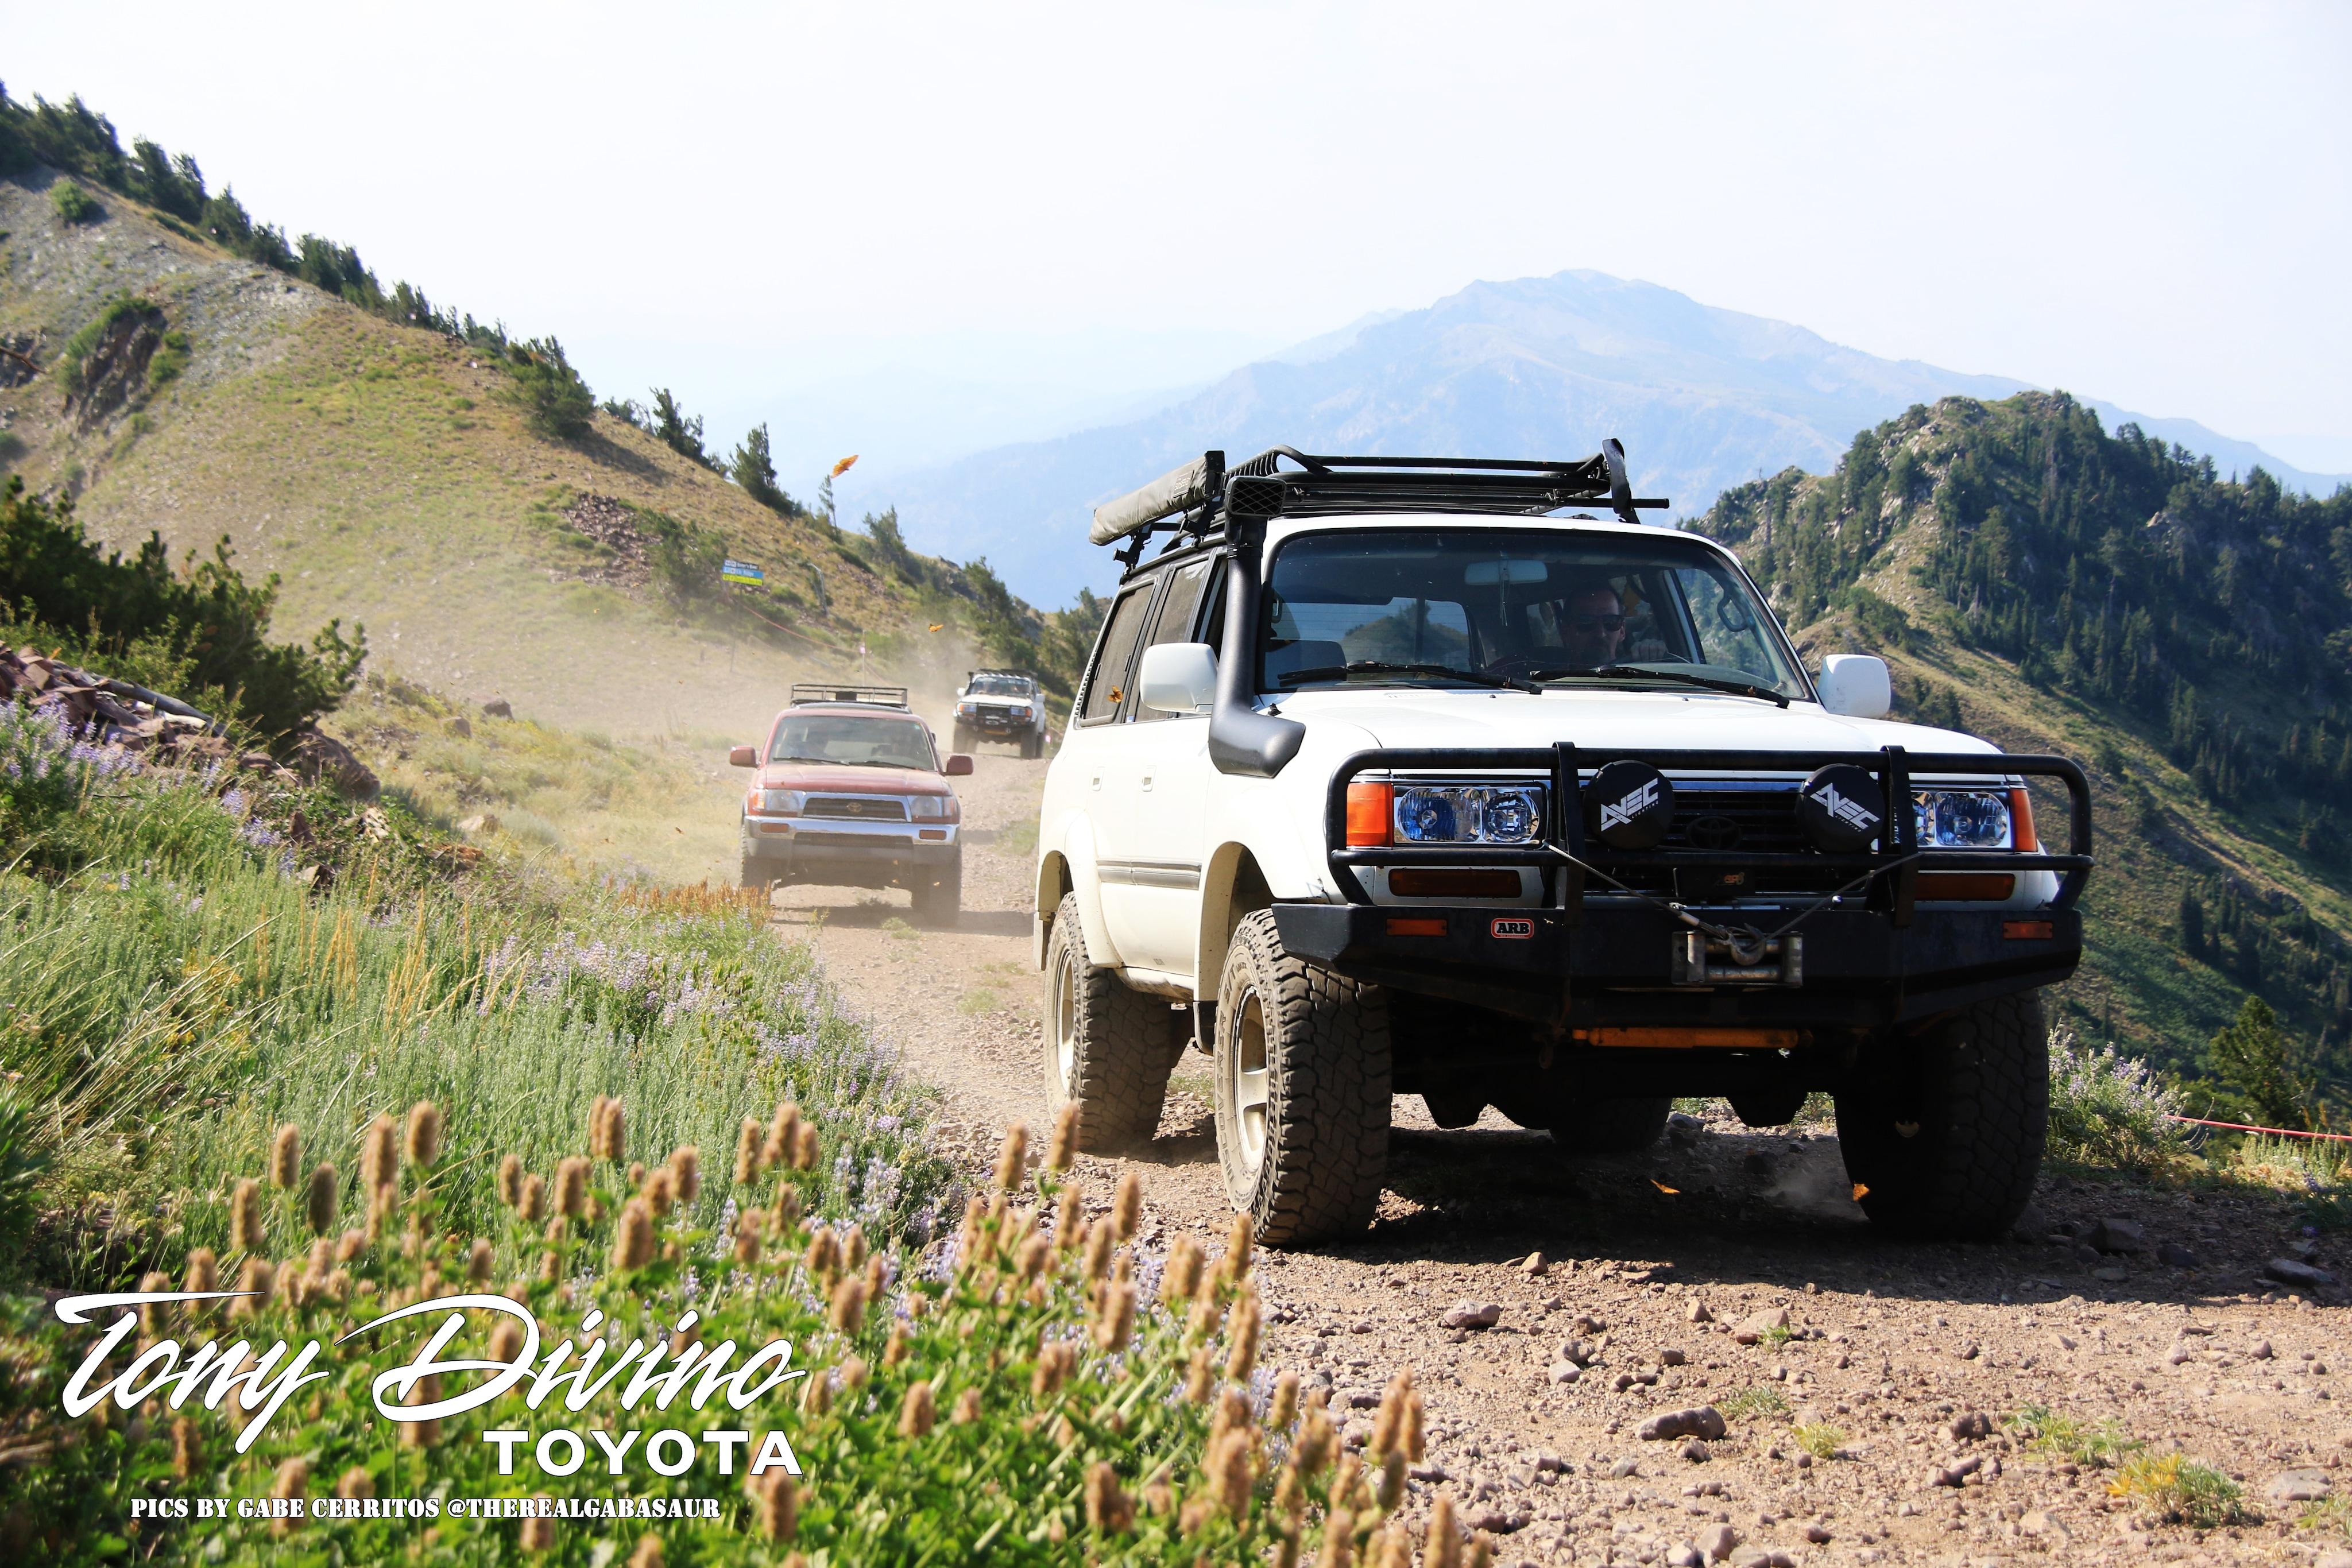 Utah Toyota Offroad Show | Tony Divino Toyota